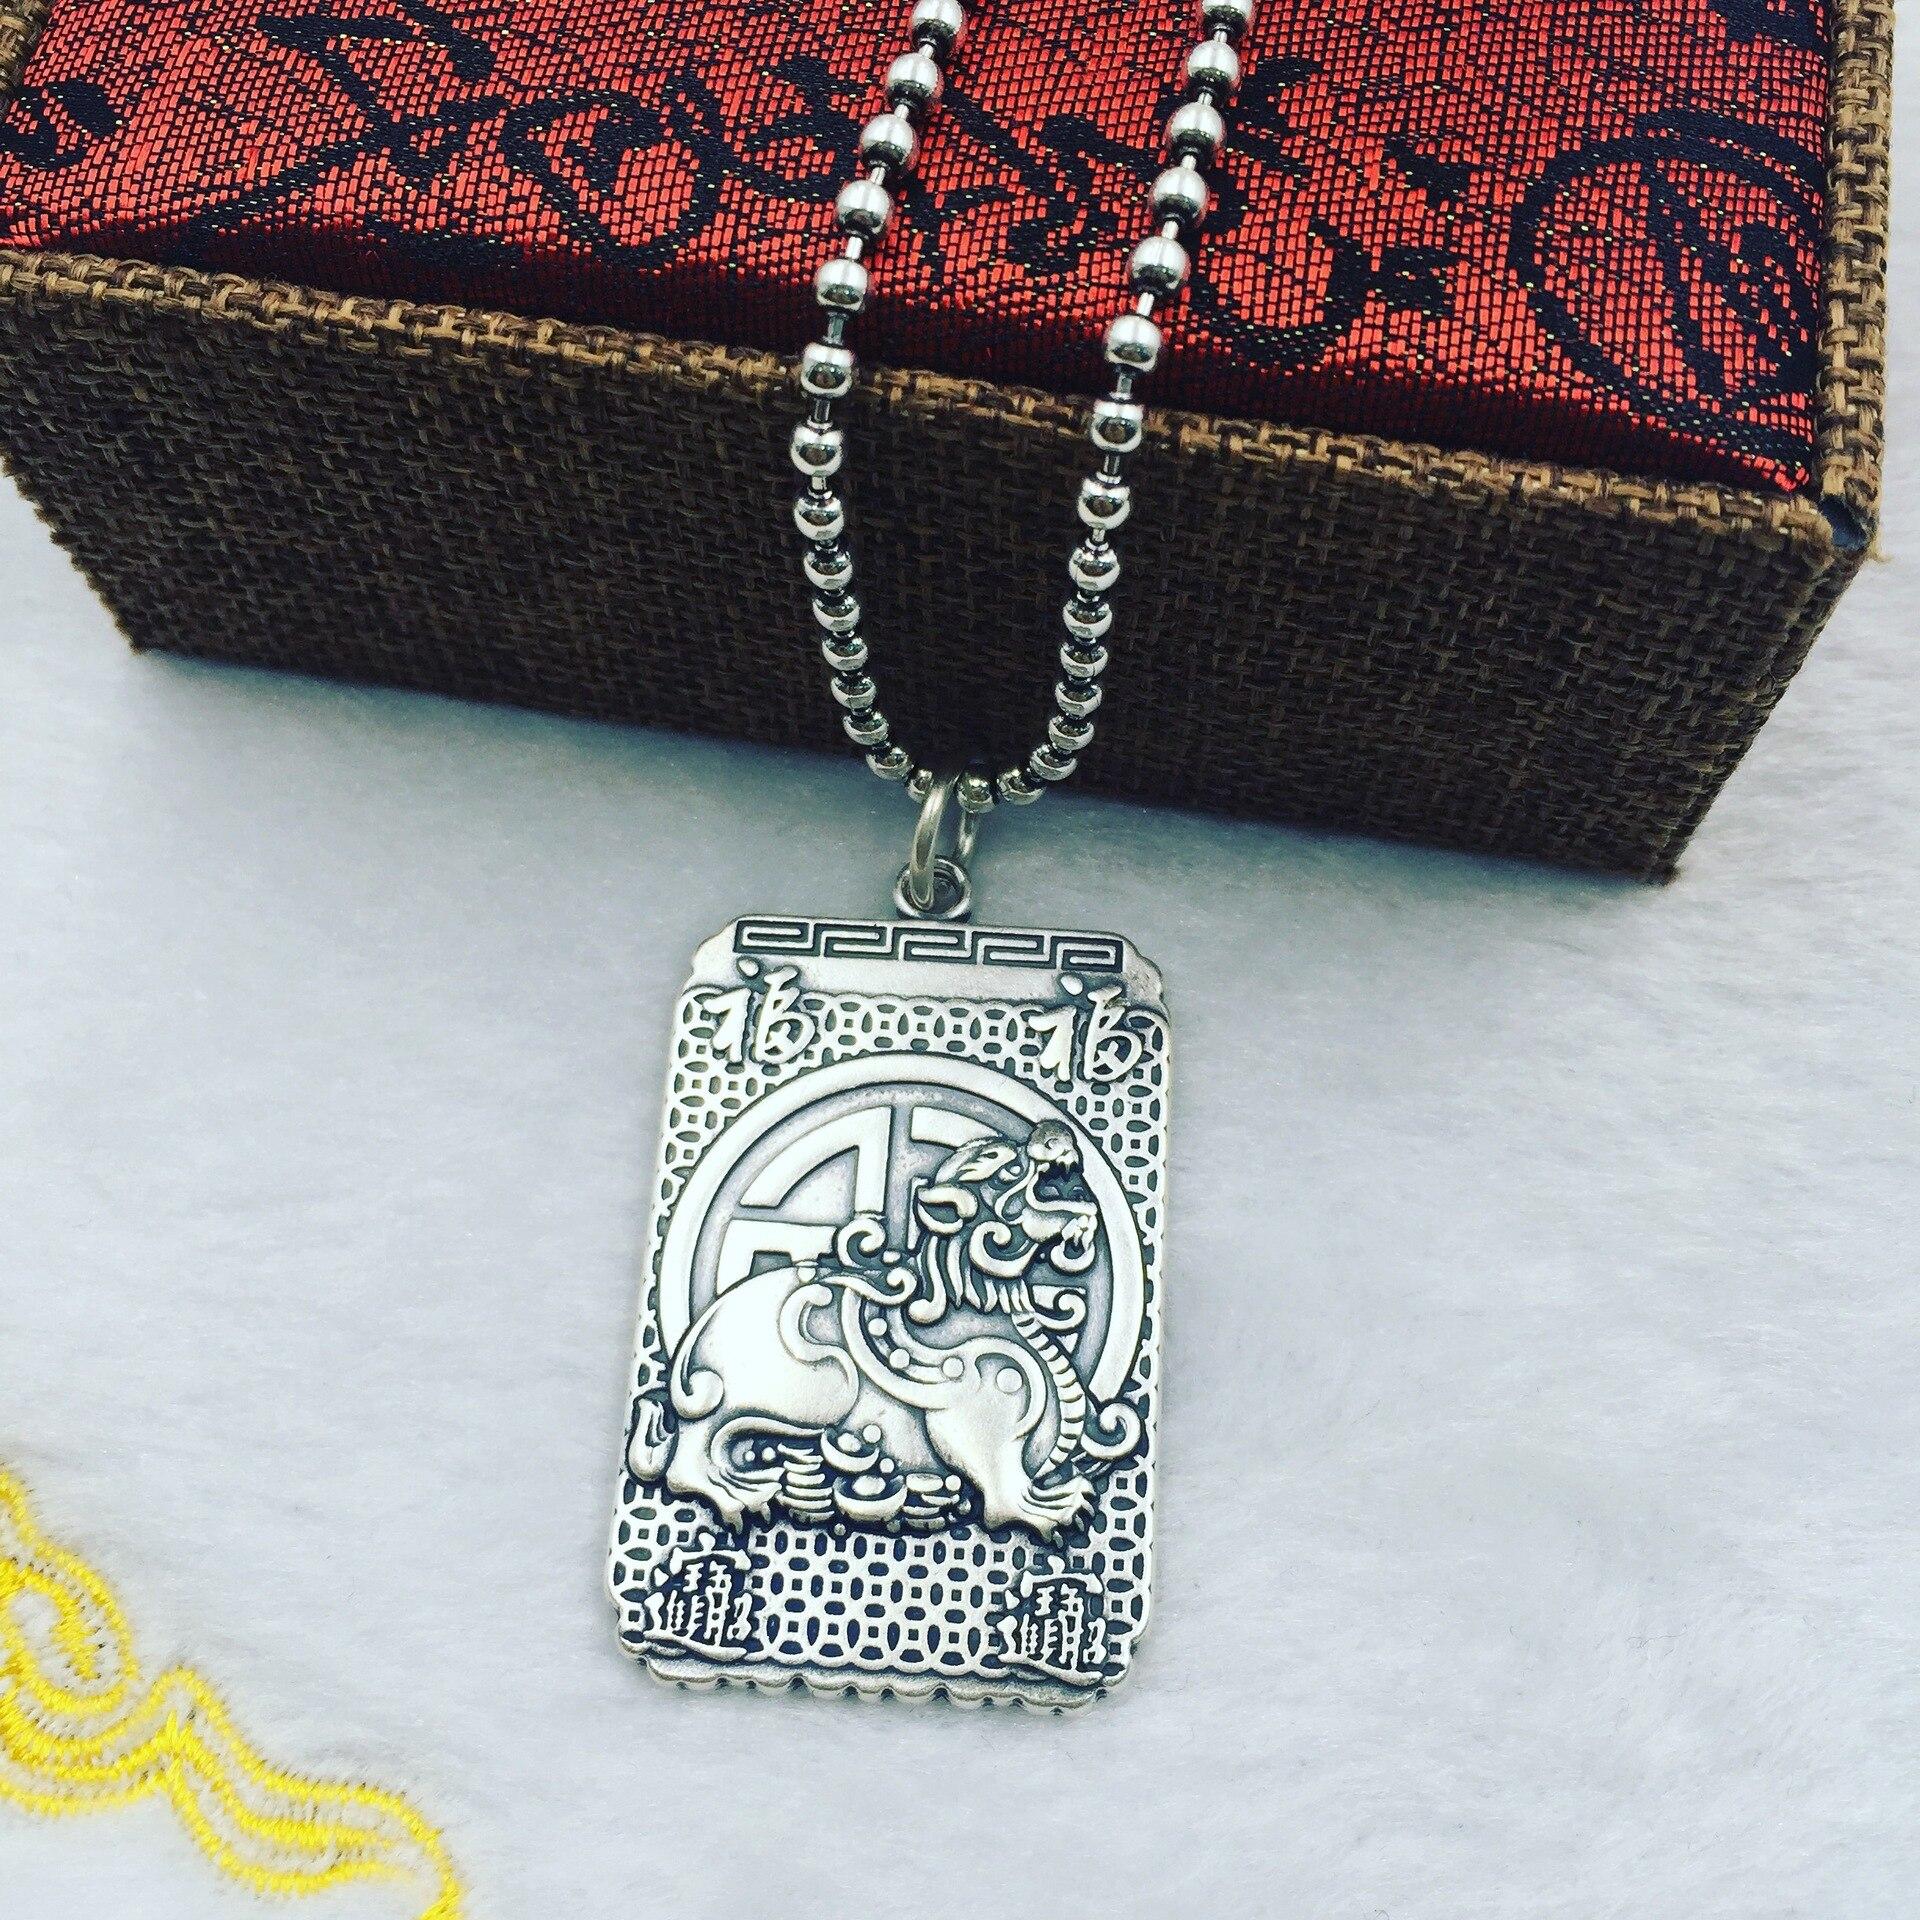 S990 silver pendant generous desire to make money sweater chain pendantS990 silver pendant generous desire to make money sweater chain pendant